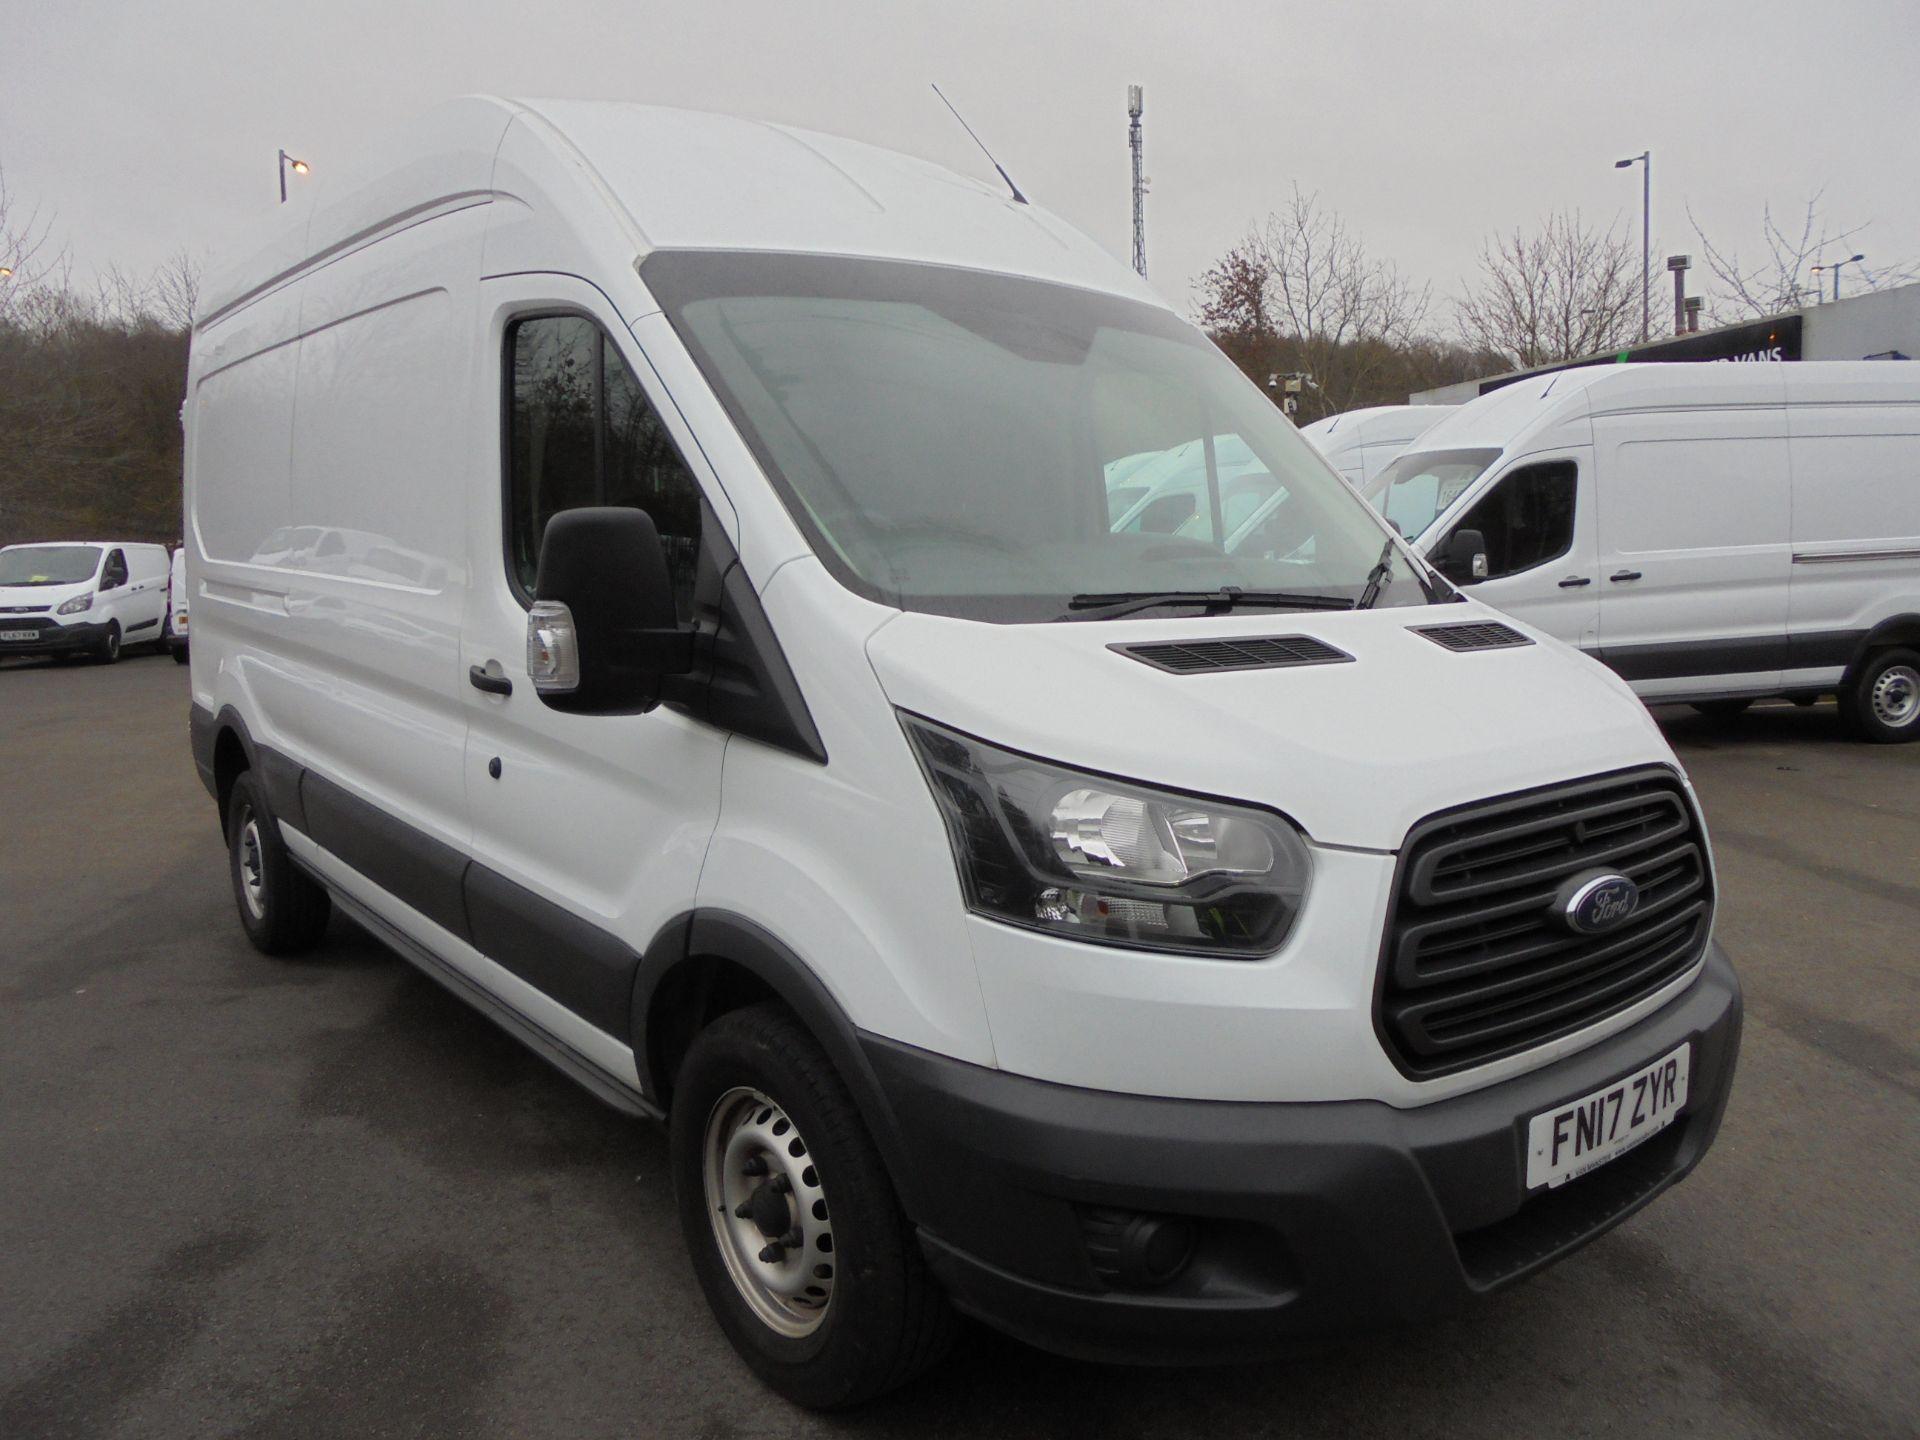 2017 Ford Transit 2.0 Tdci 130Ps H3 Van (FN17ZYR)